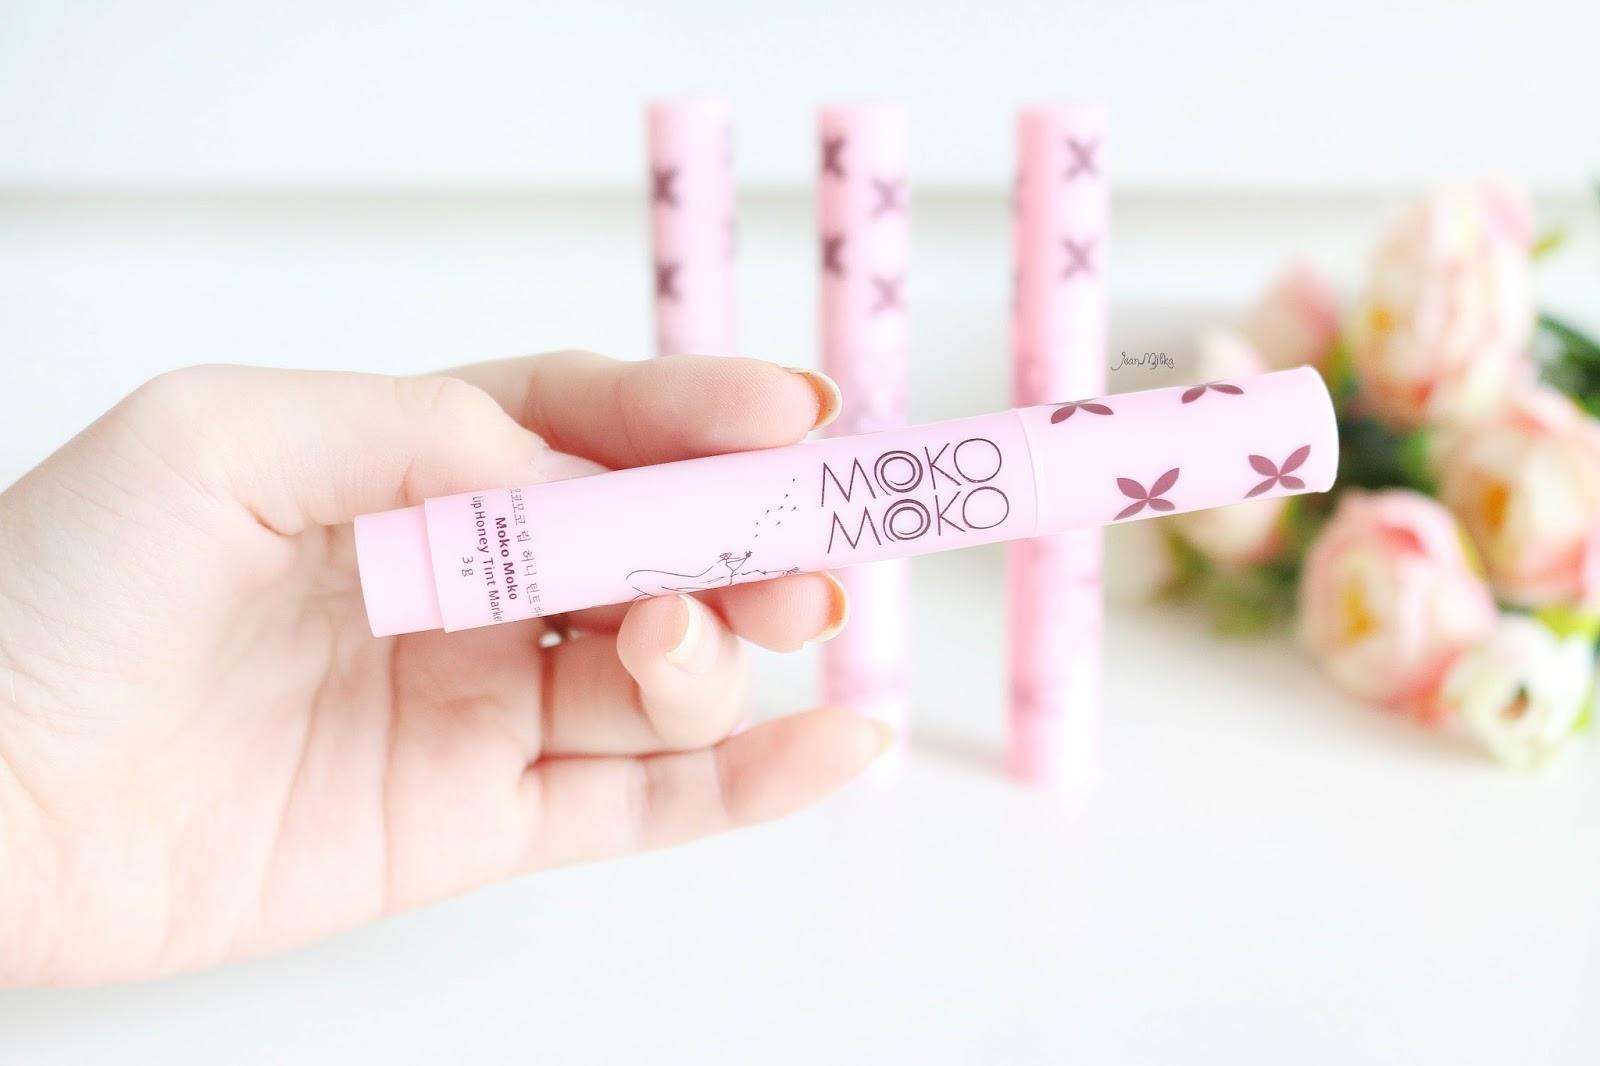 moko moko, review moko moko, swatch moko moko, swatch moko moko lip honey tint marker, moko moko lip honey tint marker, lip tint, lip honey tint markert, beauty blog indonesia